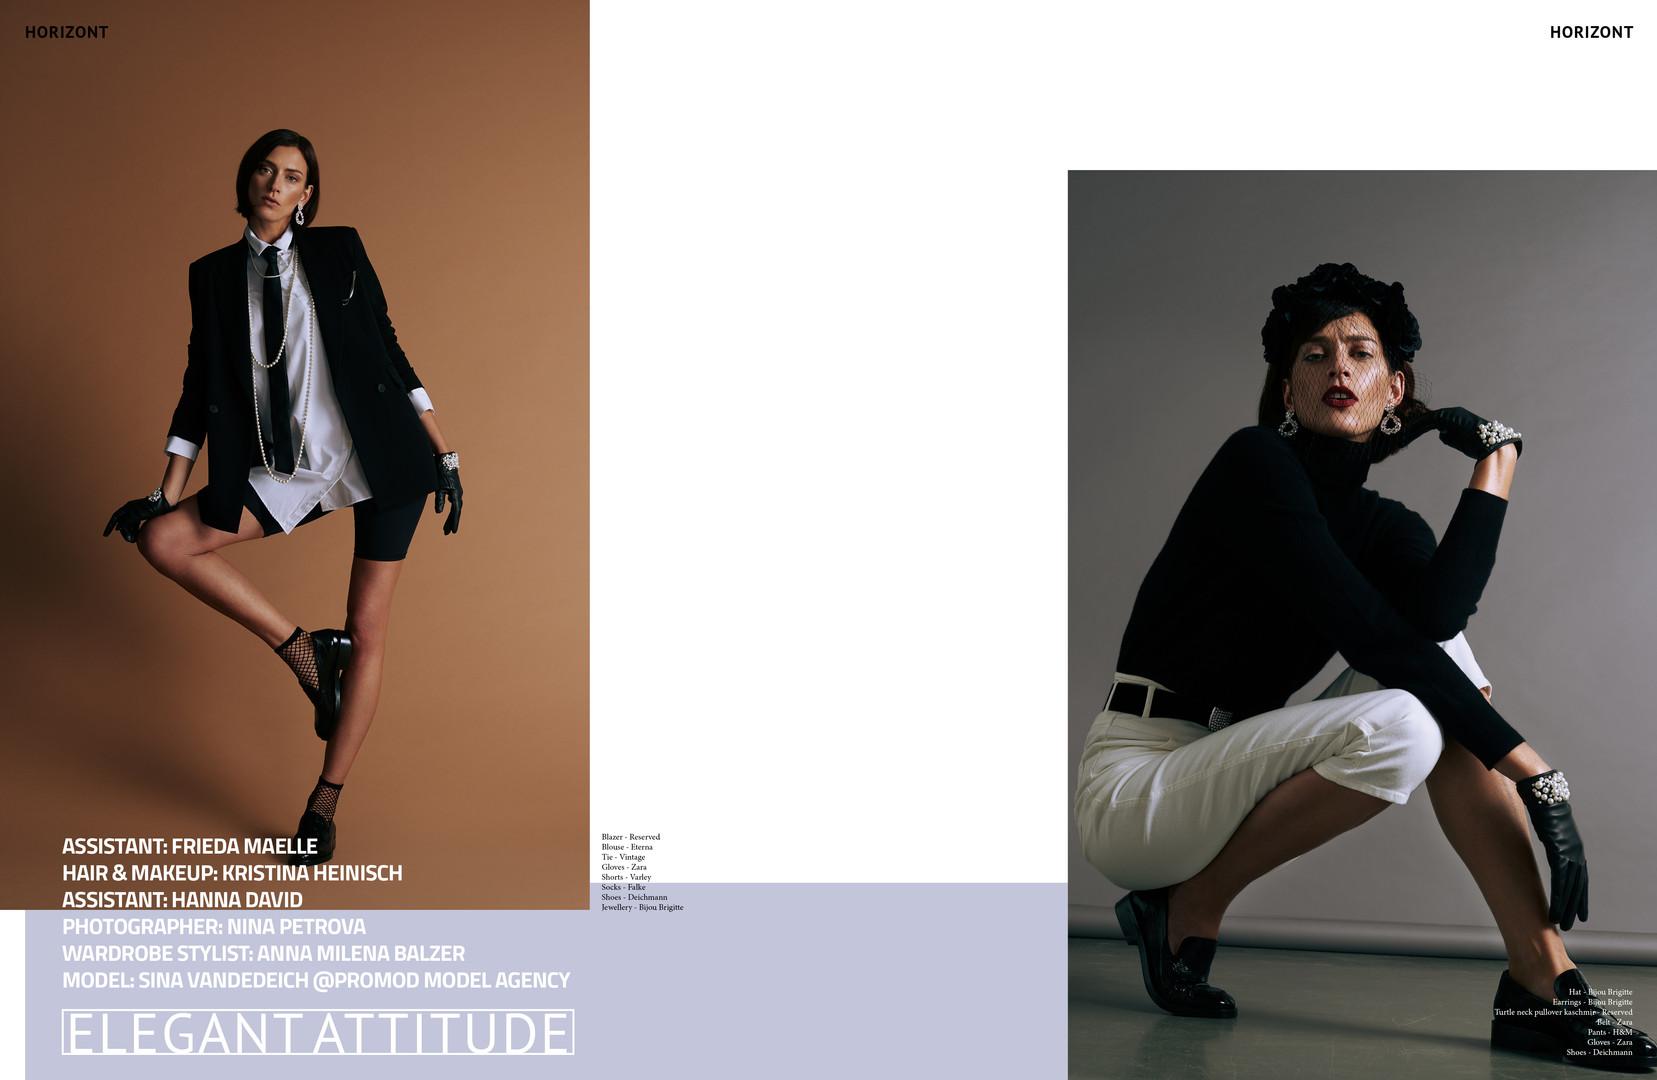 Elegant Attitude - Horizont Magazine